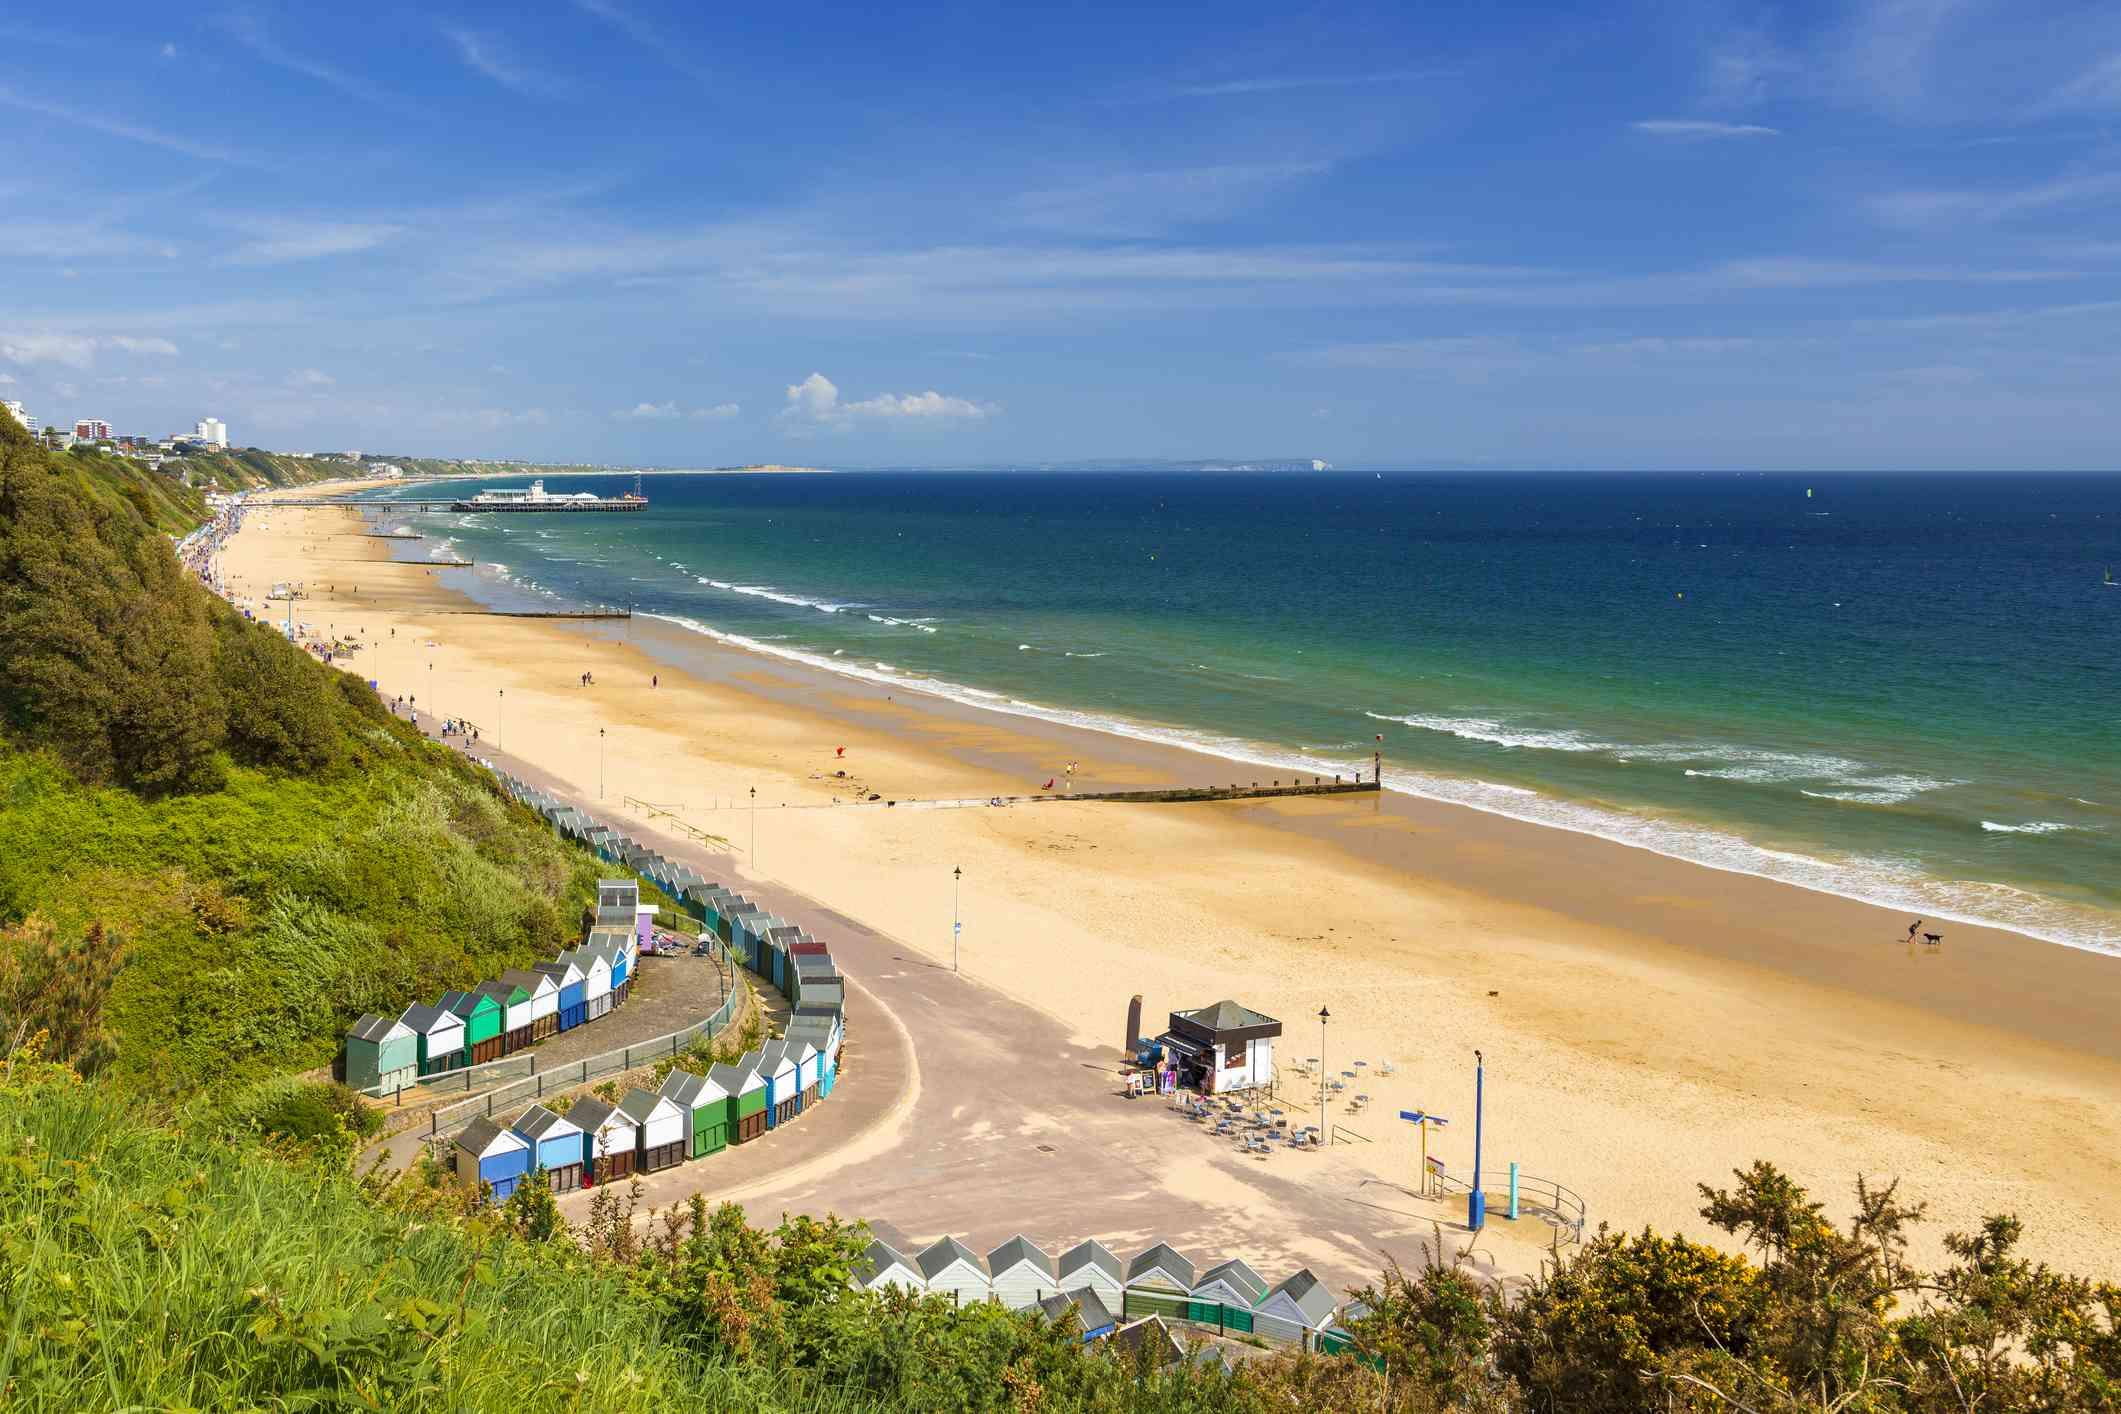 Bournemouth beach, pier, sea and sand